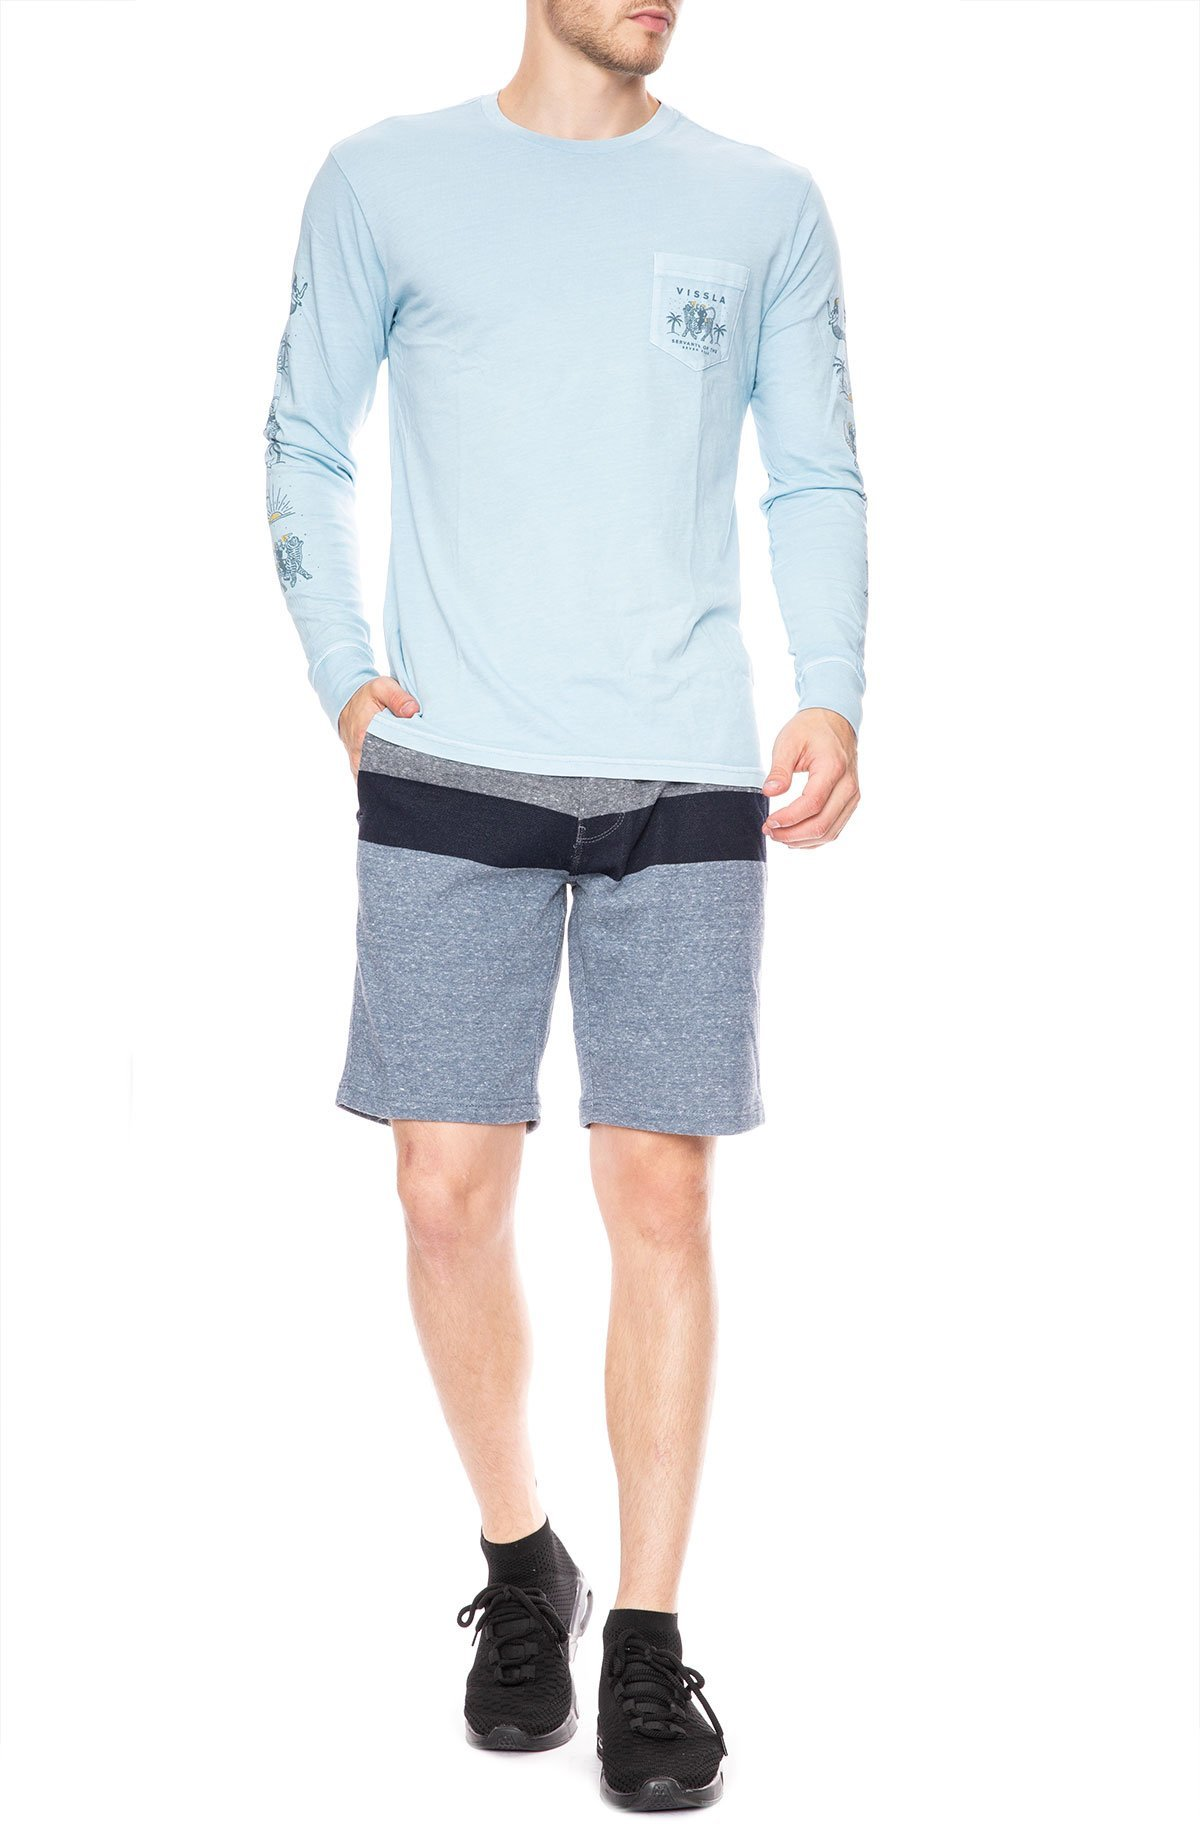 28c6168553 Vissla Genie Long Sleeve T-Shirt - Ice Blue